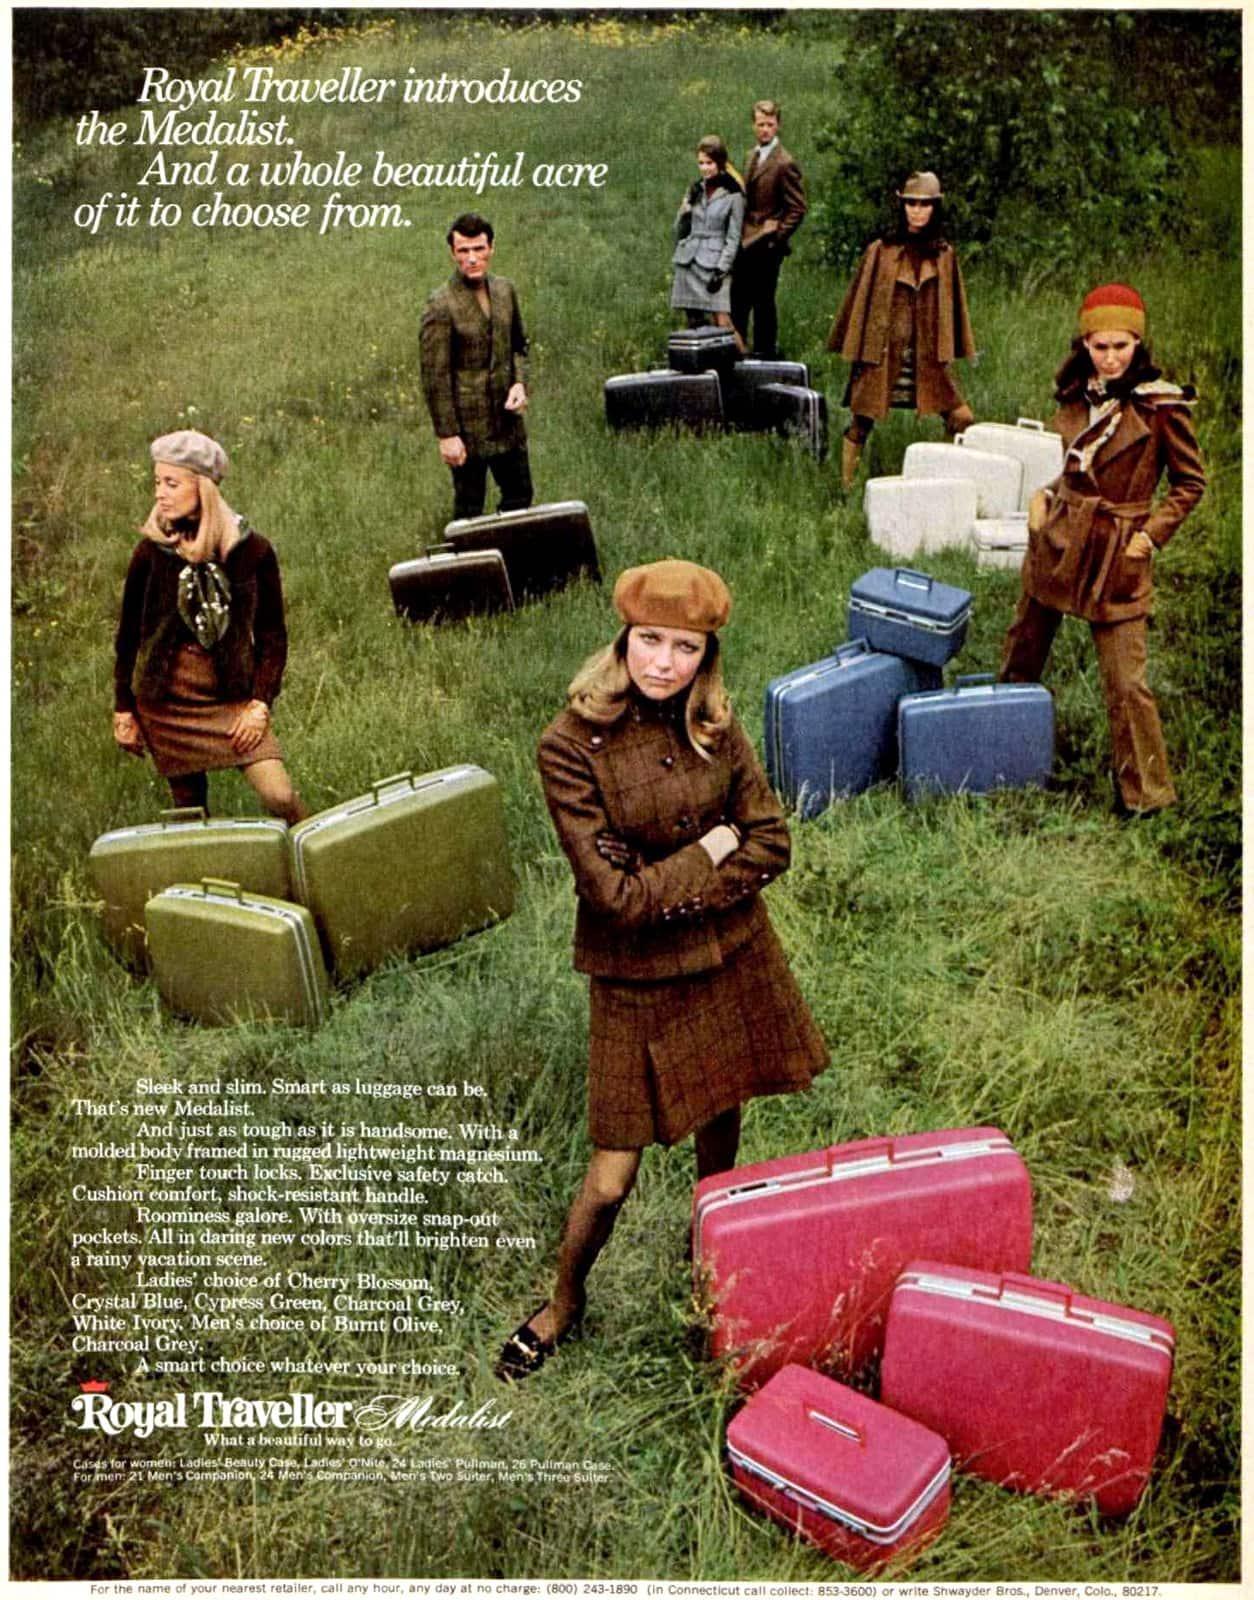 Royal Traveller luggage (1968)